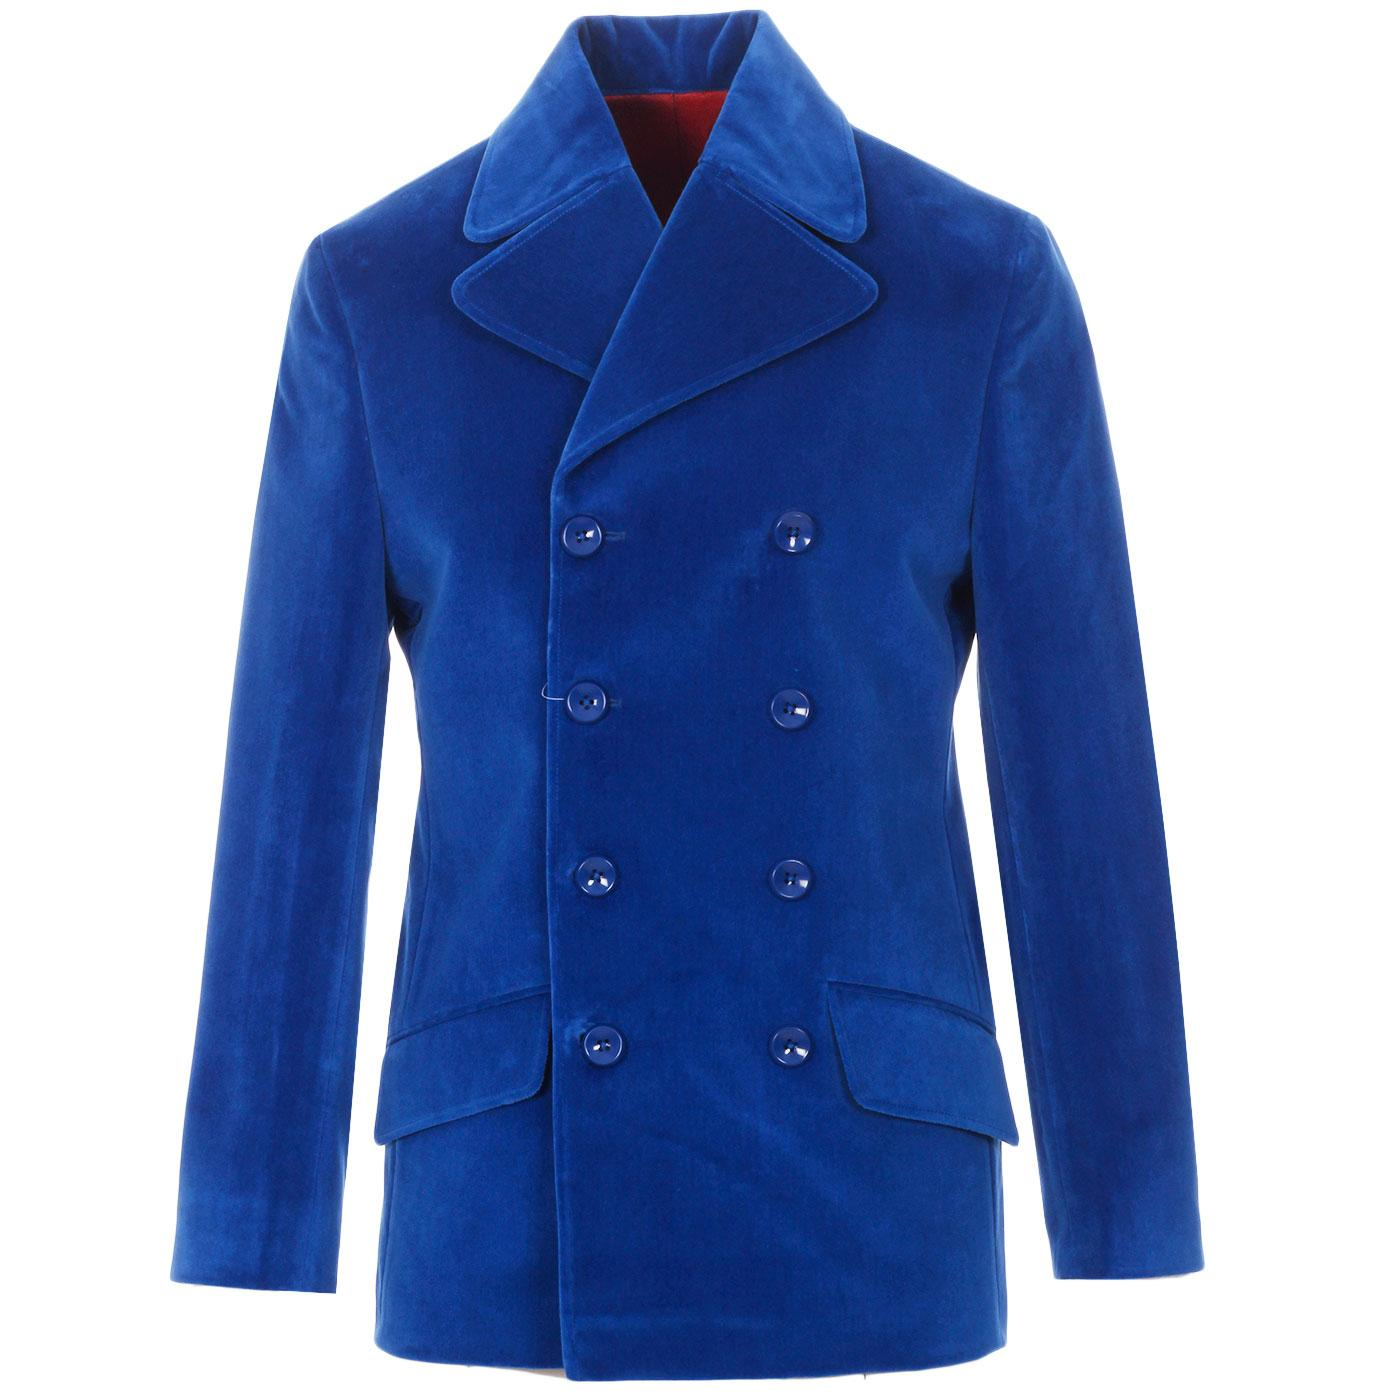 Velvet Breed MADCAP ENGLAND 60s Mod DB Jacket